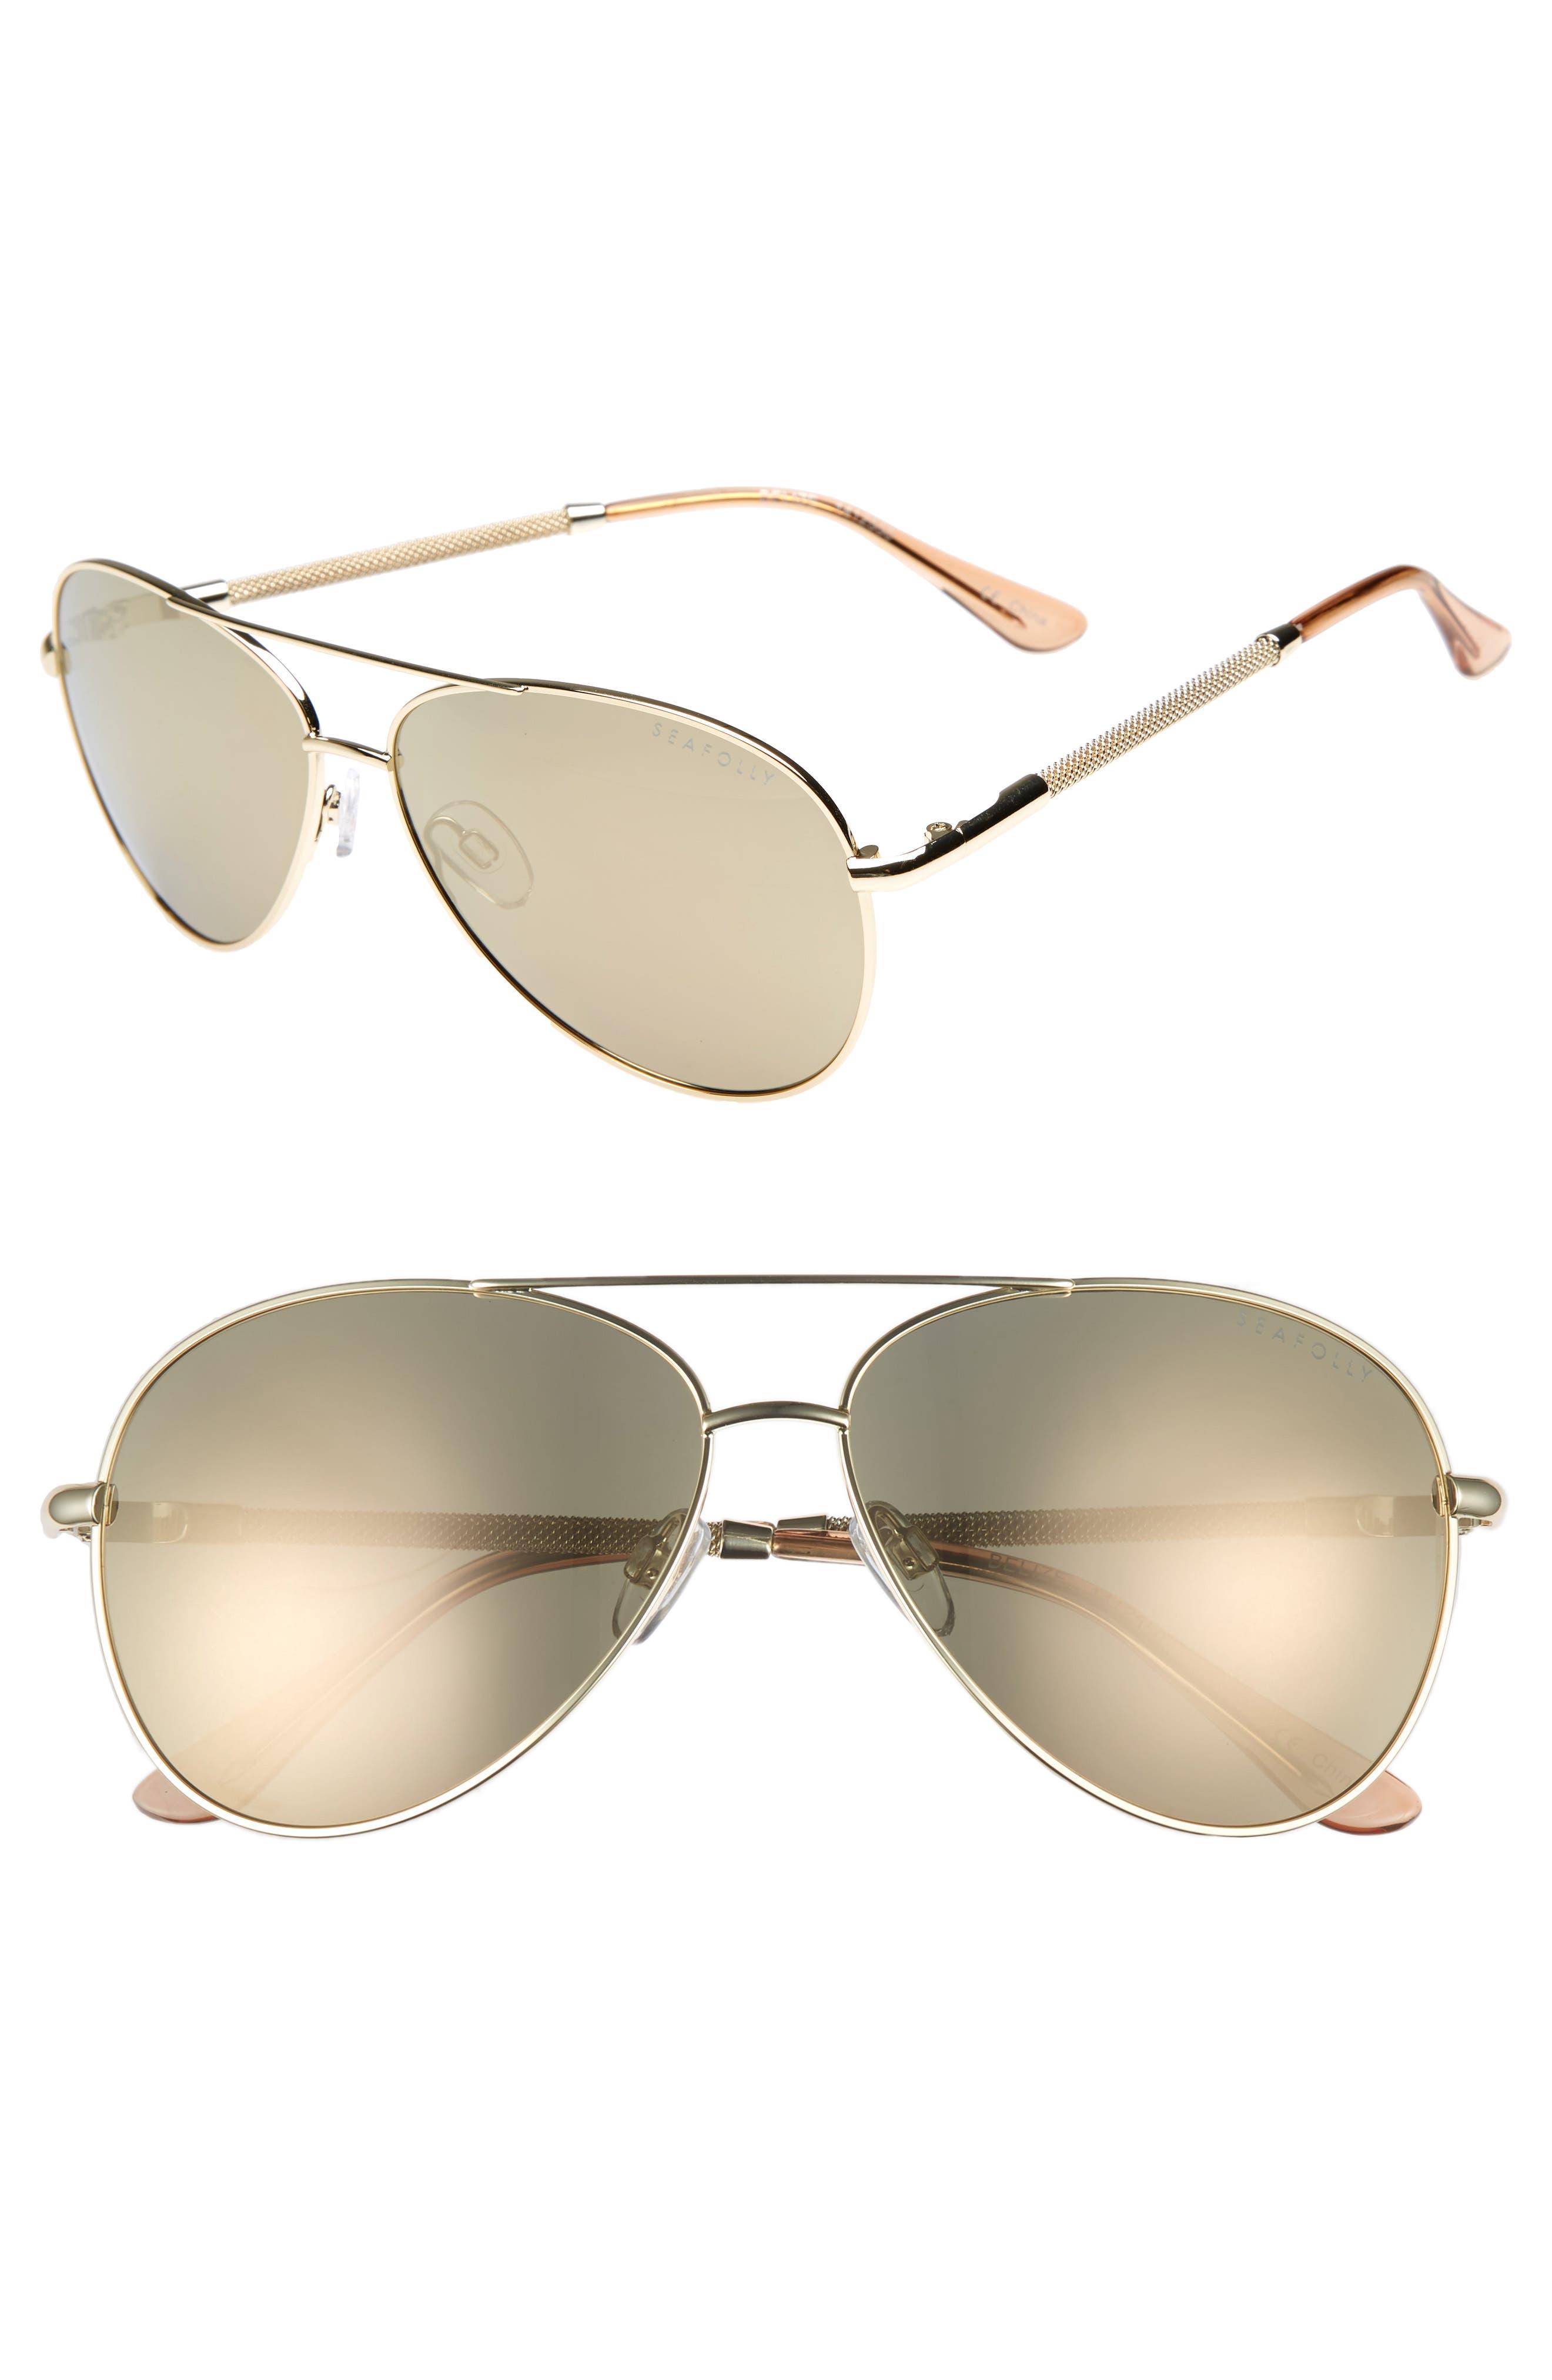 Belize 59mm Aviator Sunglasses,                         Main,                         color,